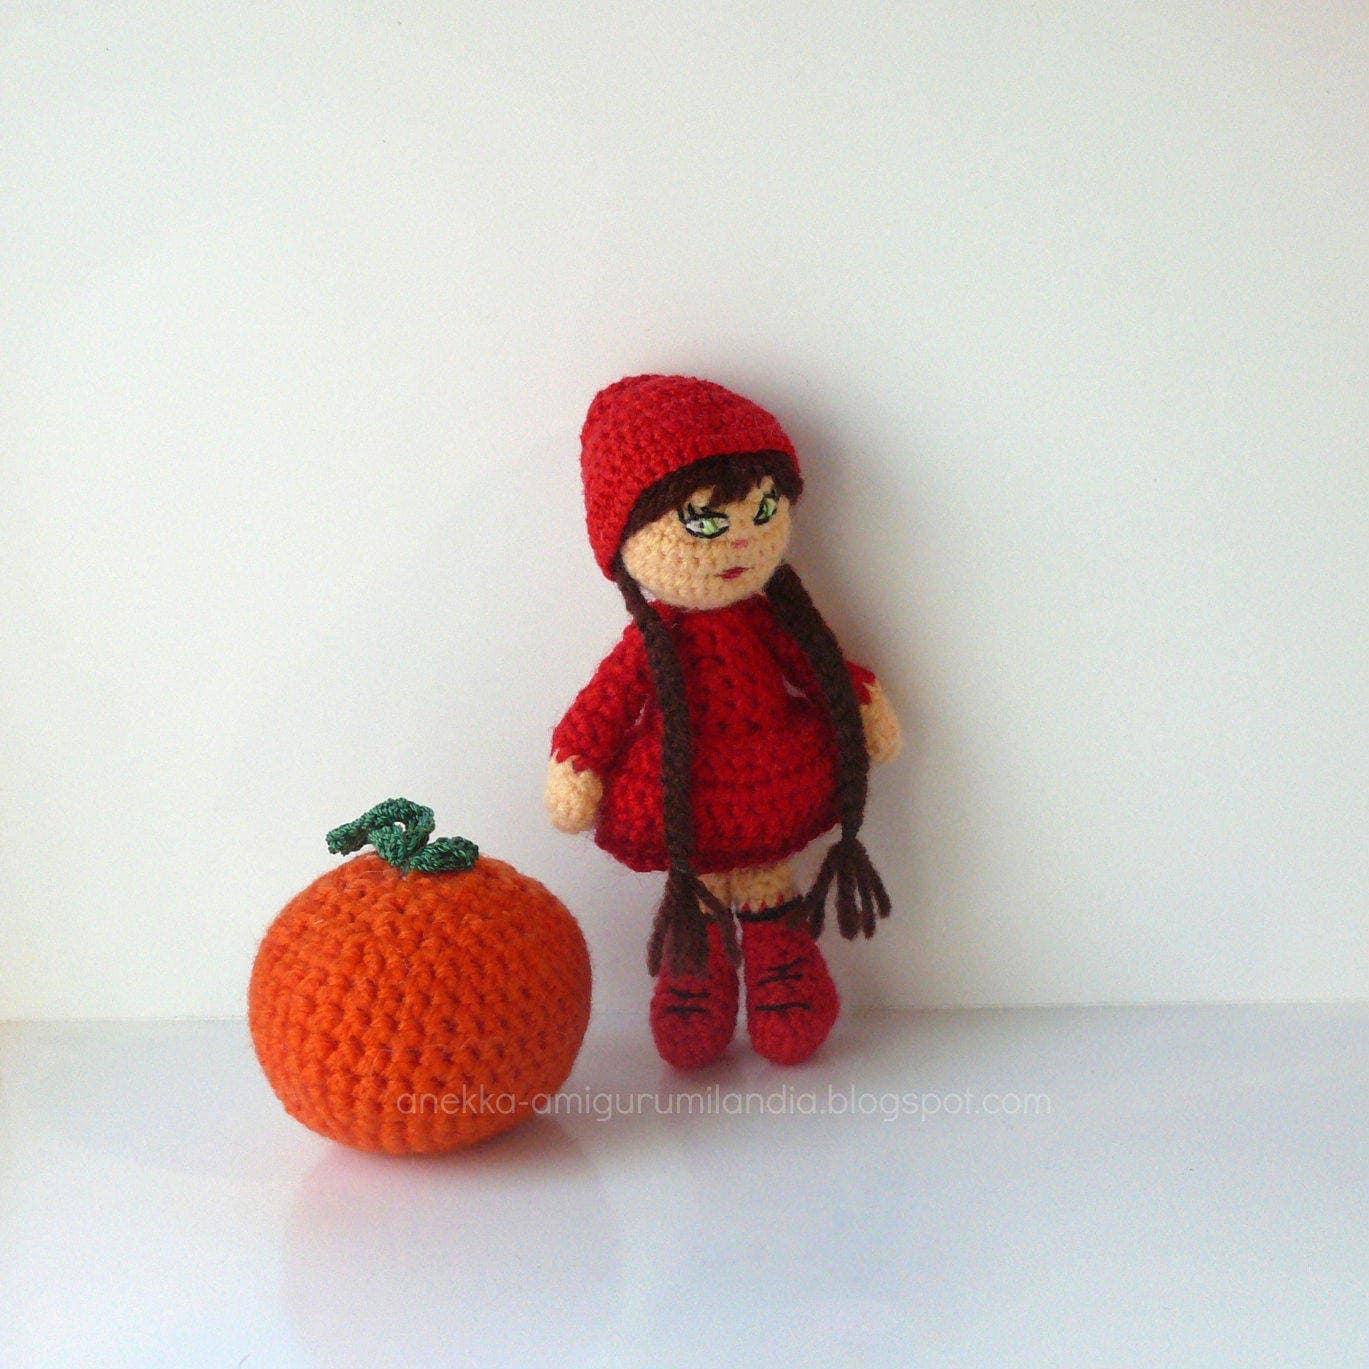 Amigurumi Small Doll : Amigurumi crochet doll Little Red Riding Hood wool toy